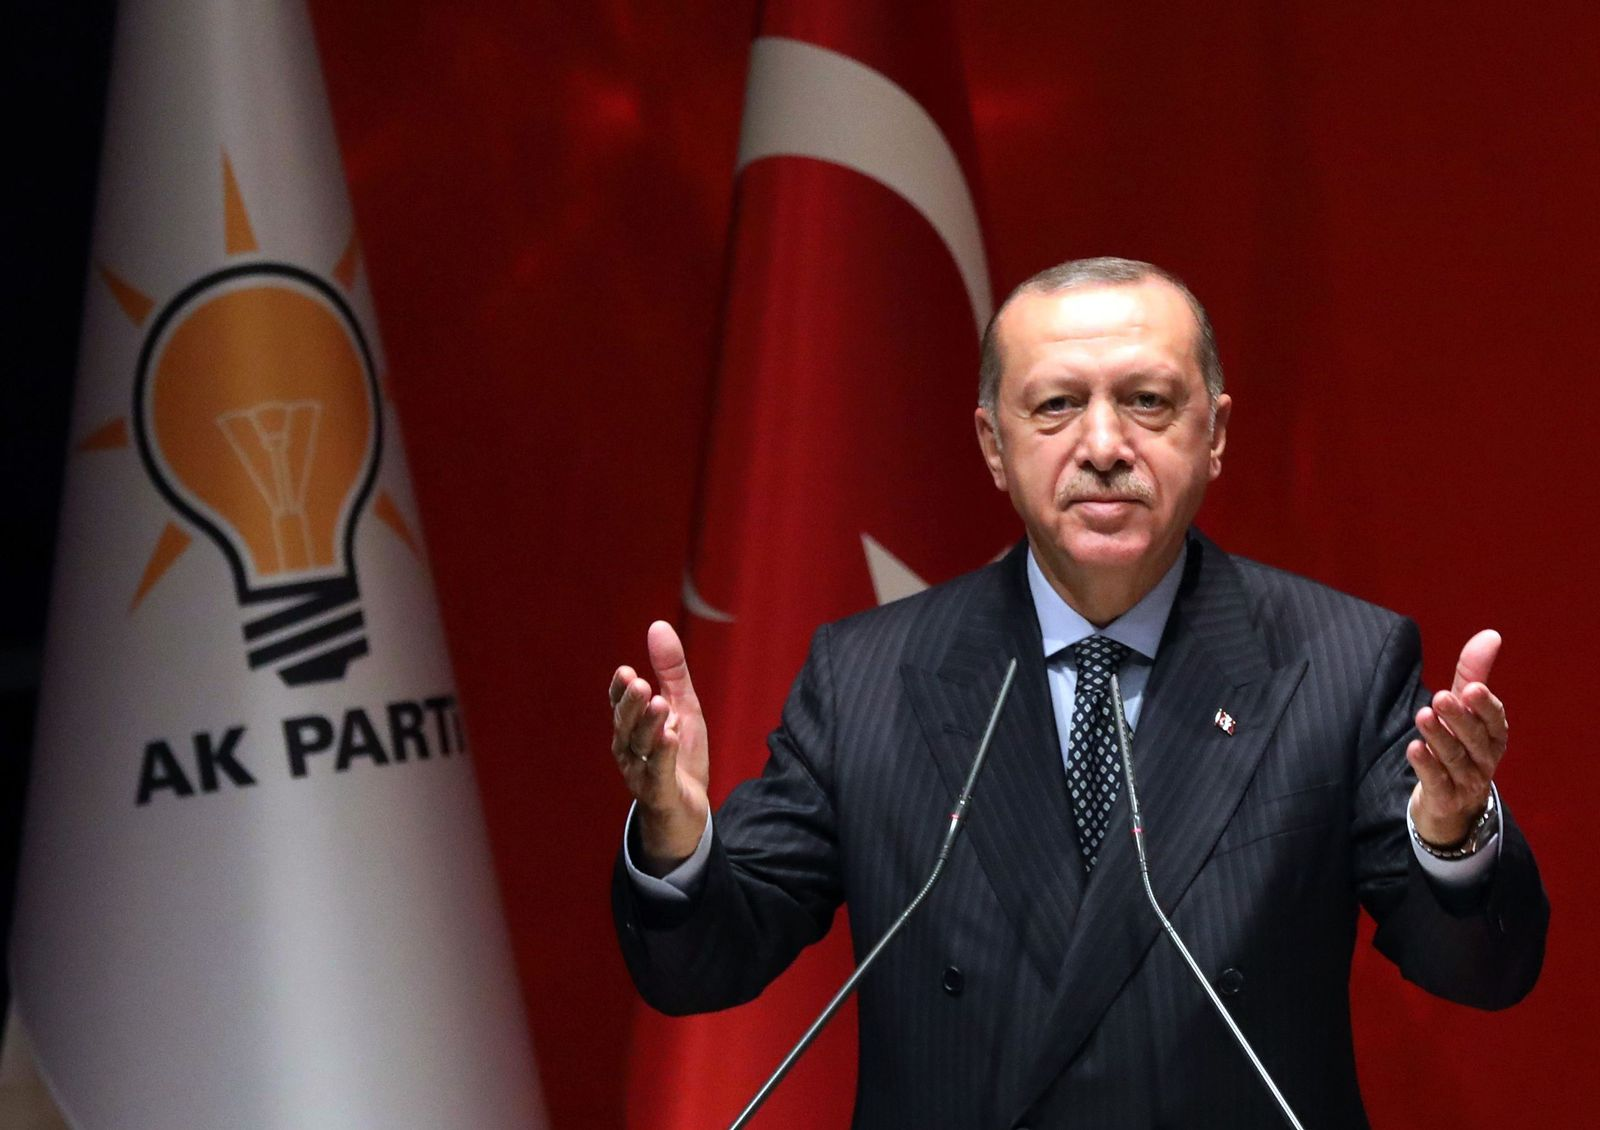 TURKEY-POLITICS Erdogan